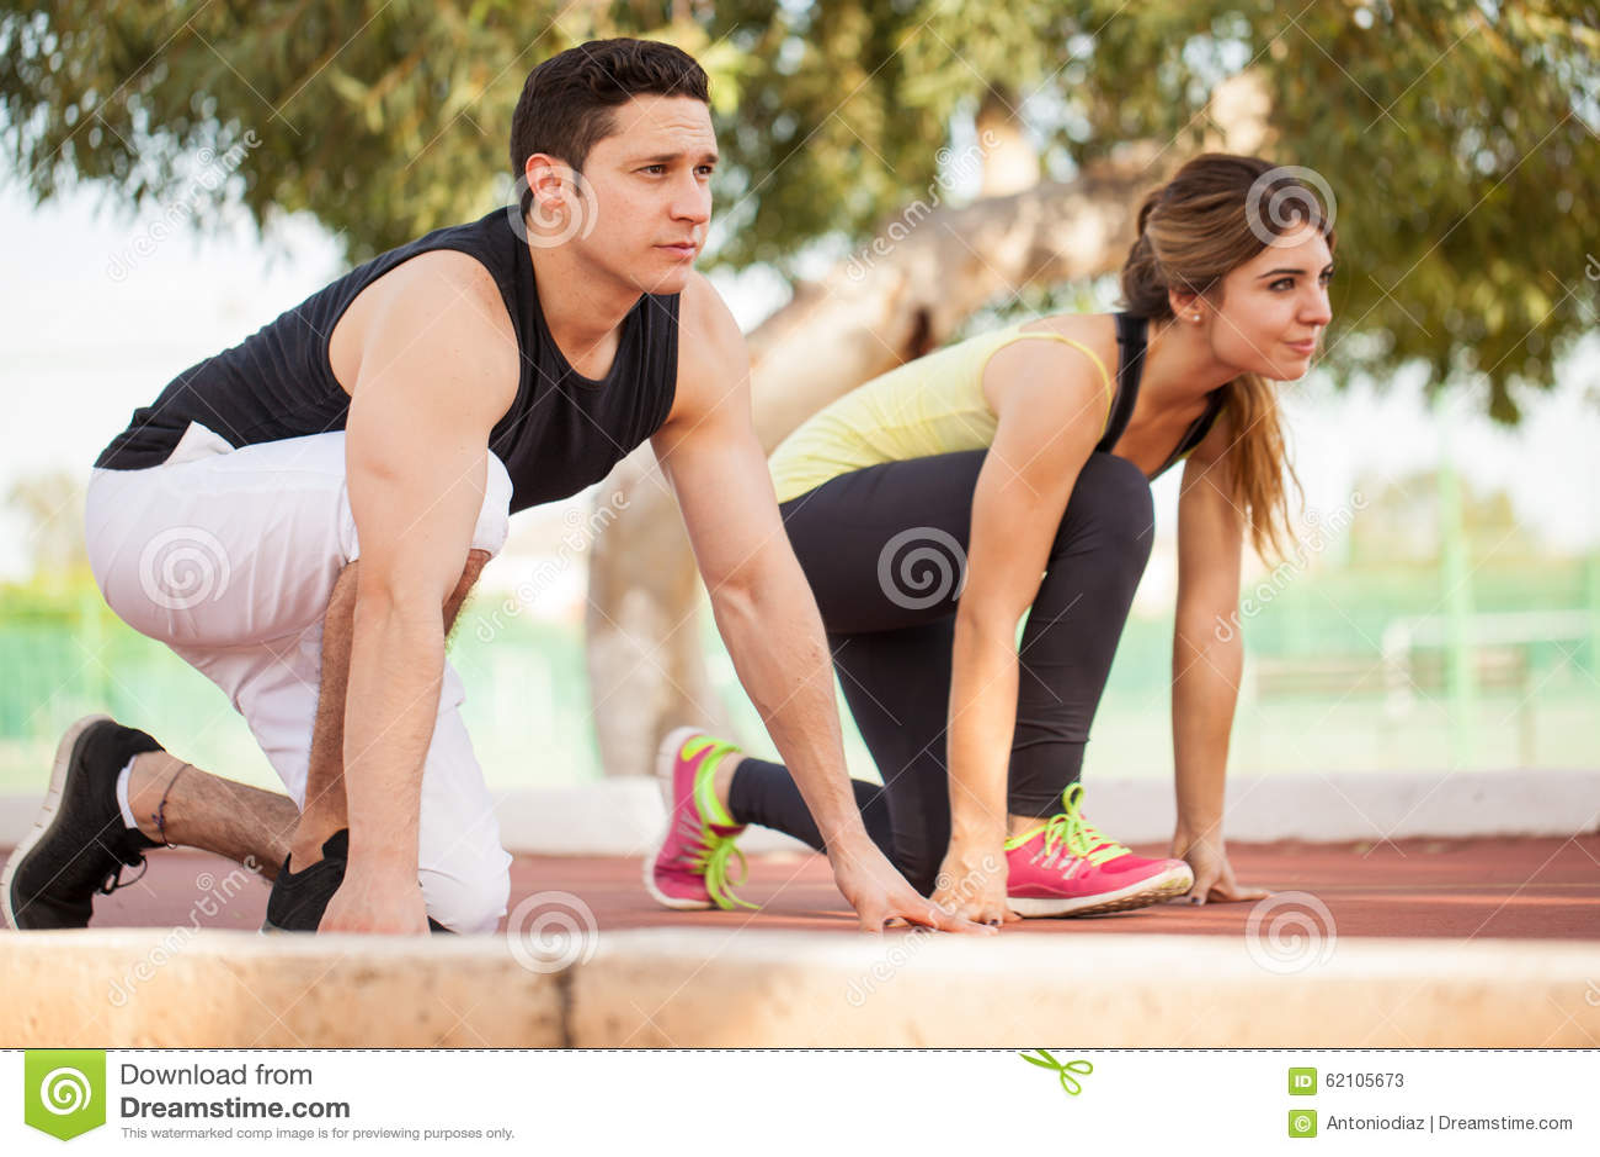 dating jogging thailand online dating app